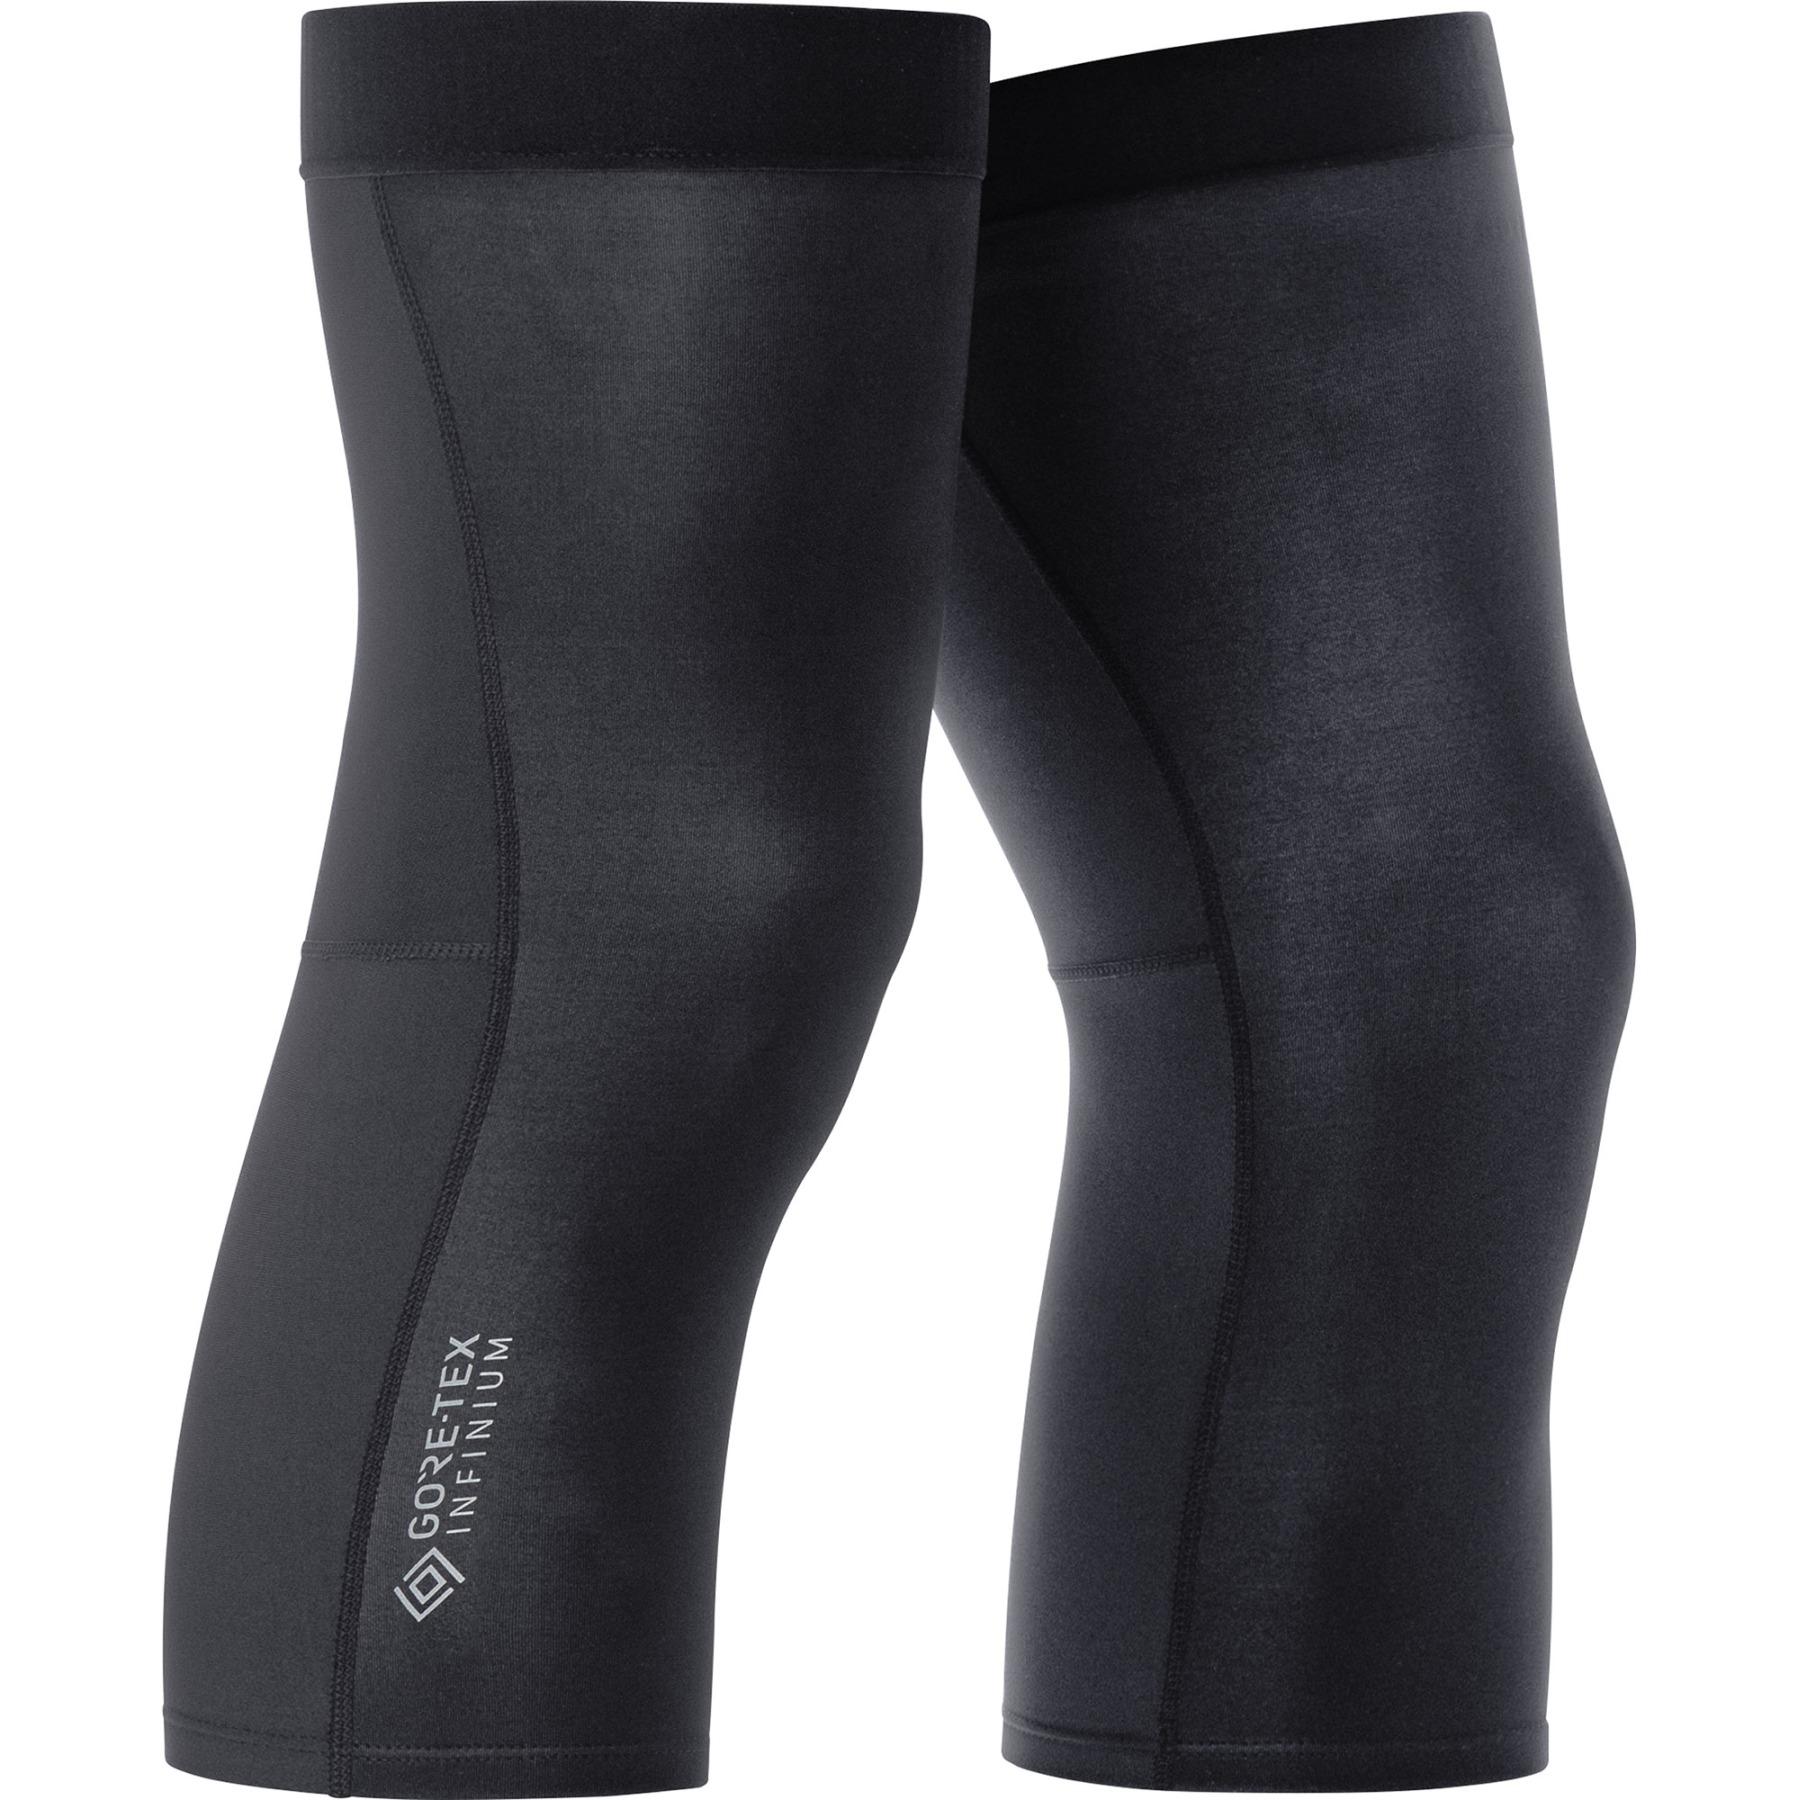 GORE Wear Shield Rodilleras térmicas - black 9900